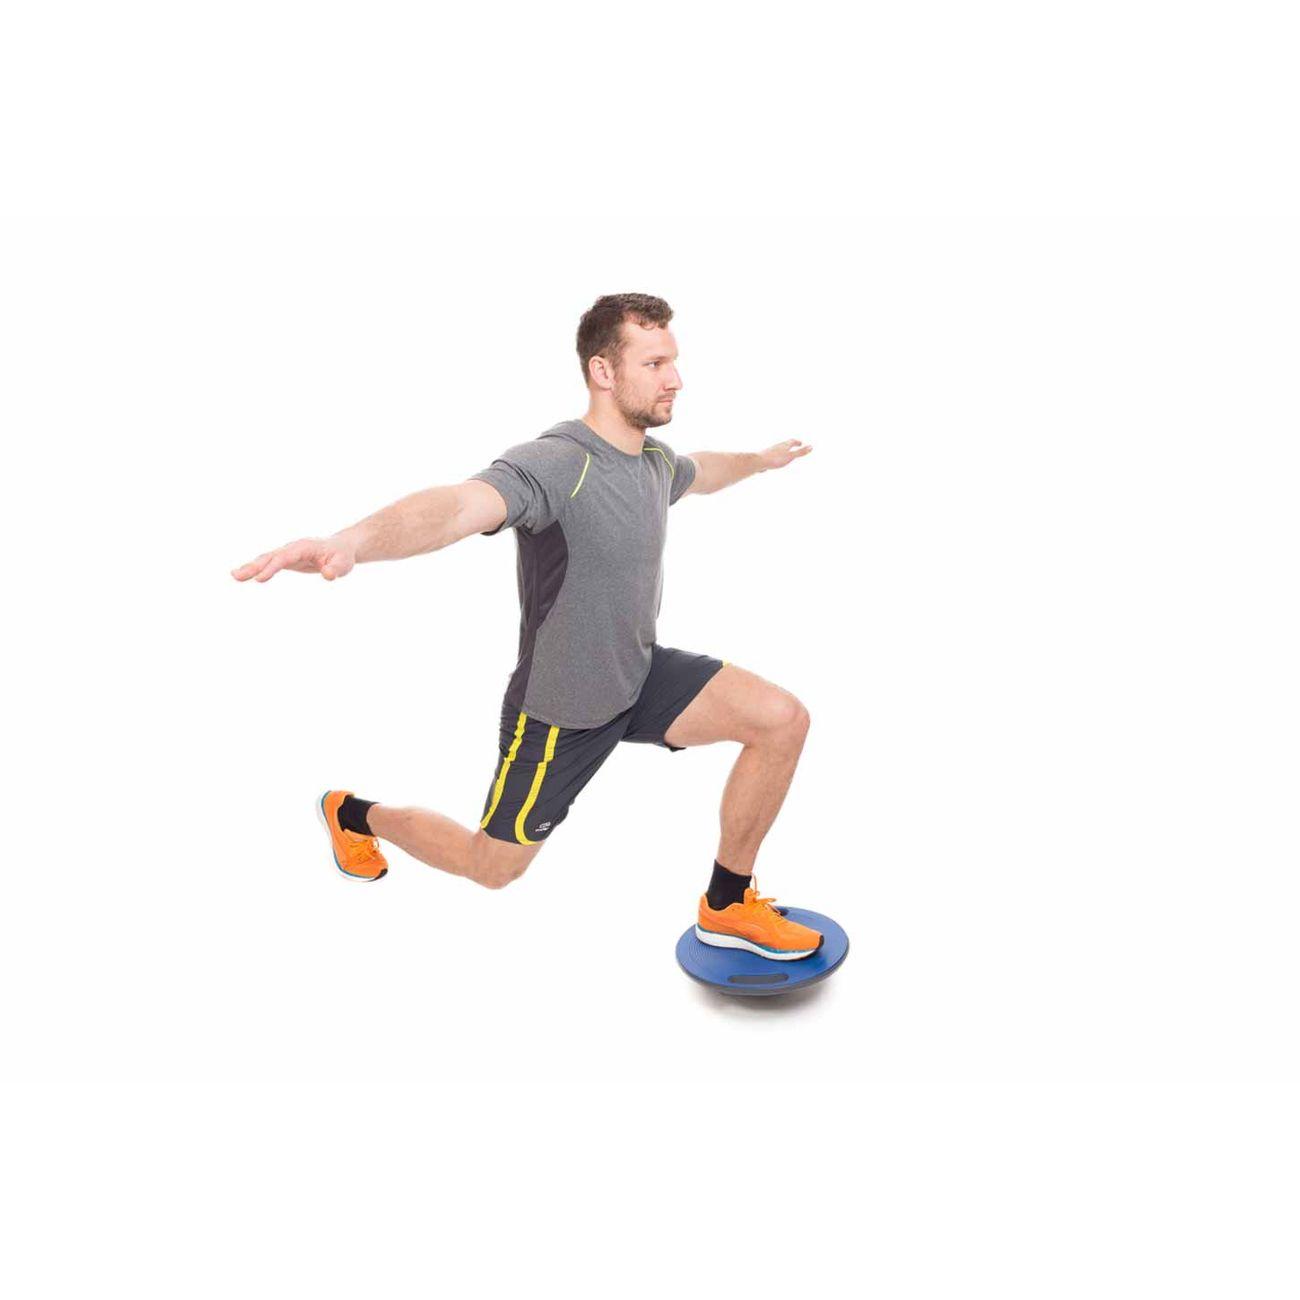 Balance Board Gyro Diamtre 40 Cm X Hauteur 10 Achat Et Prix Go Fitness Adulte Doyourfitness